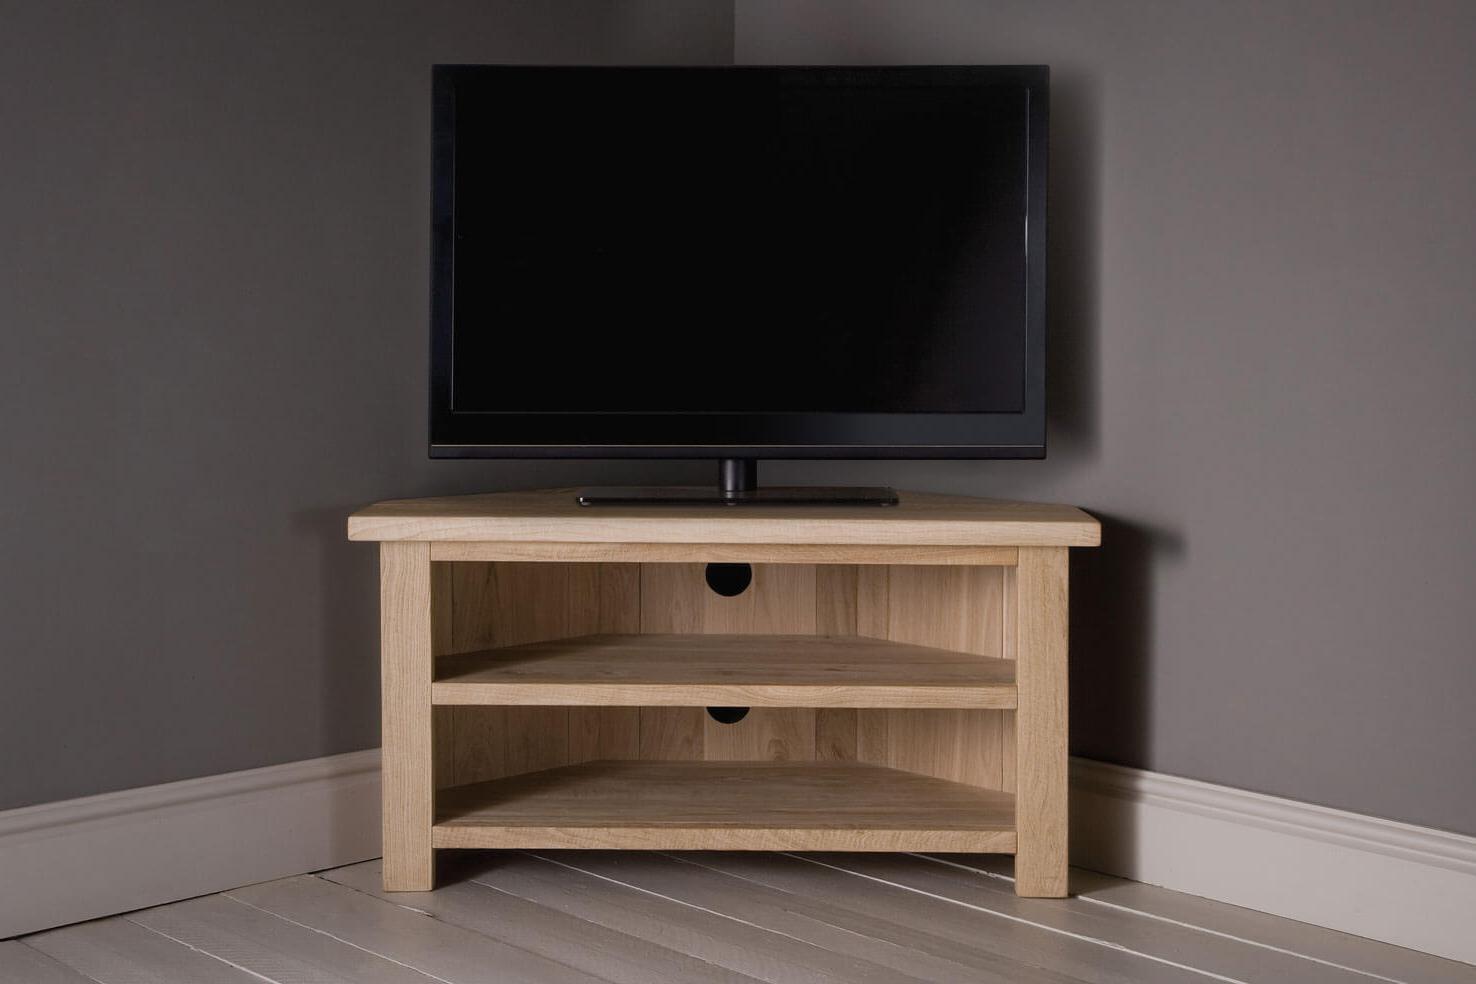 Famous Oak Corner Tv Unit With Shelfindigo Furniture In Corner Tv Units (View 11 of 20)